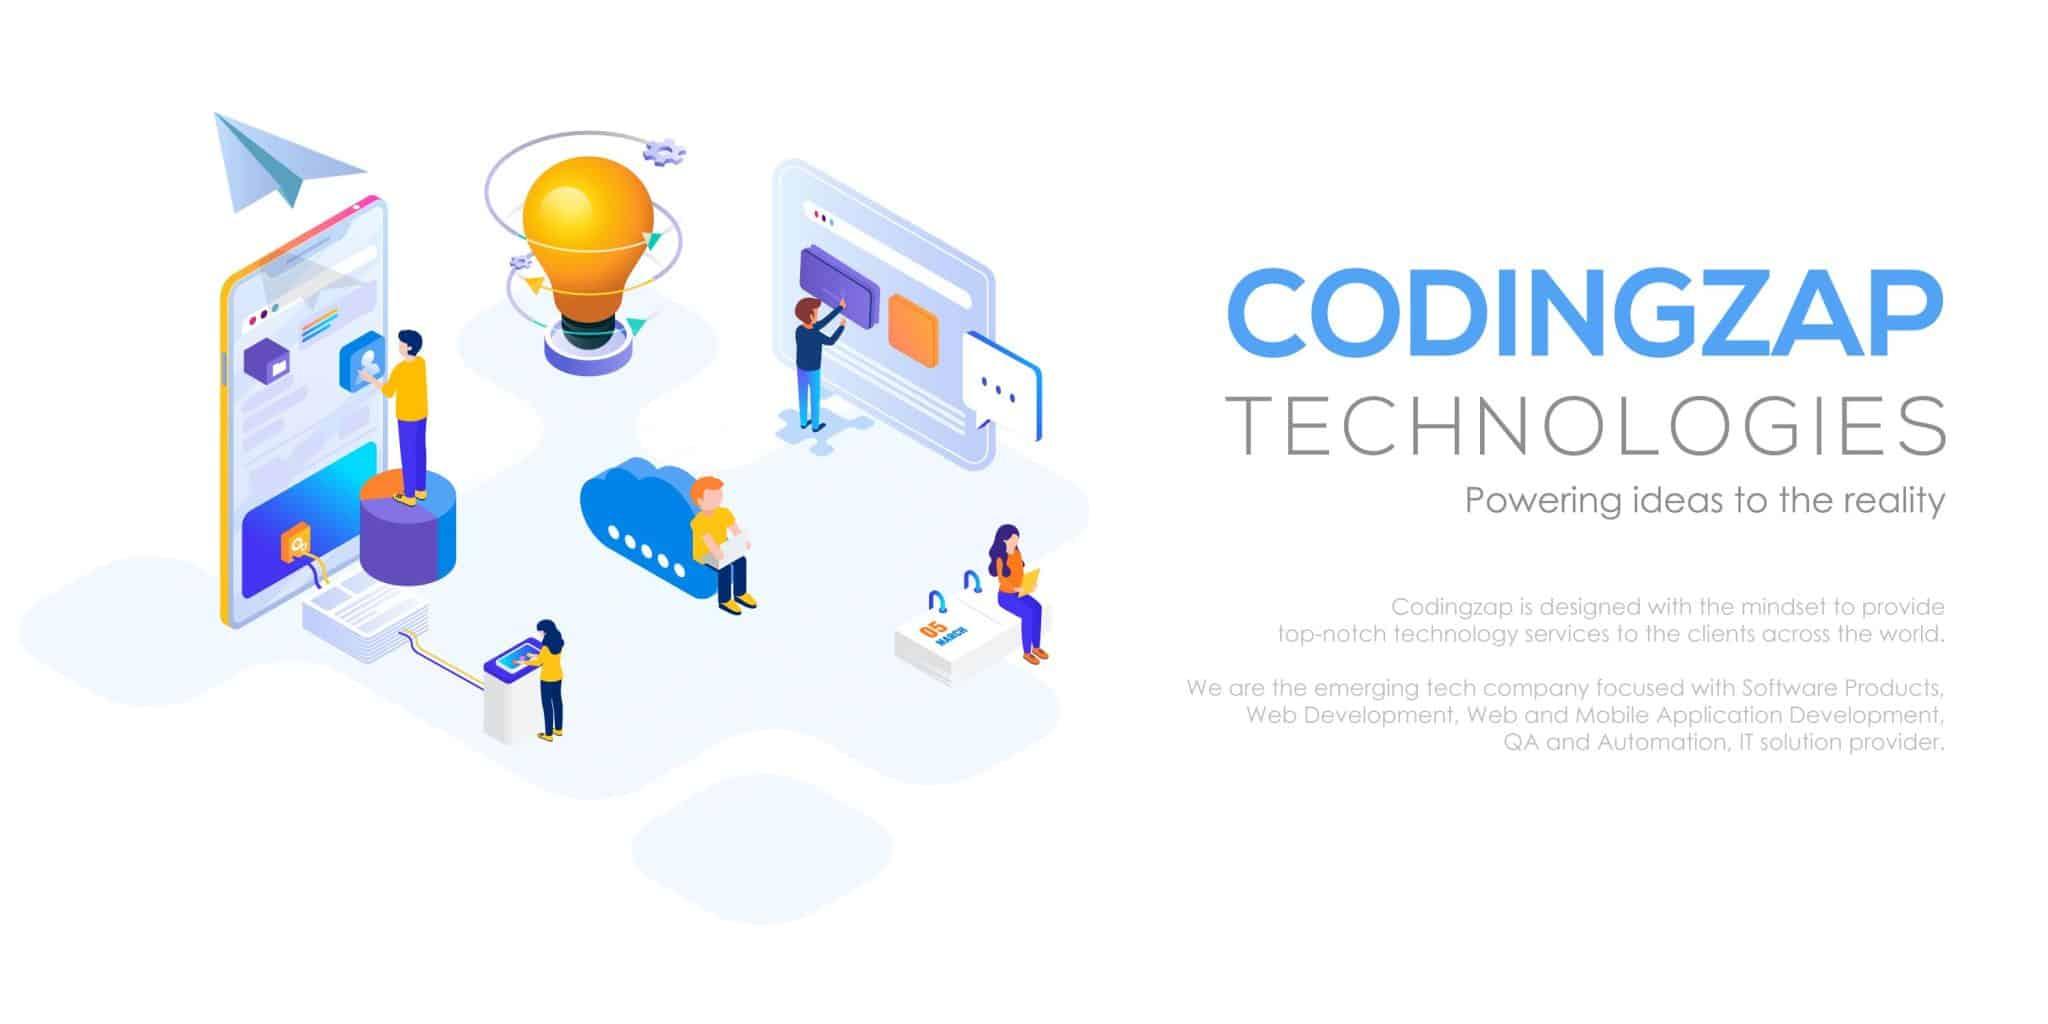 about codingzap.com - Our Company